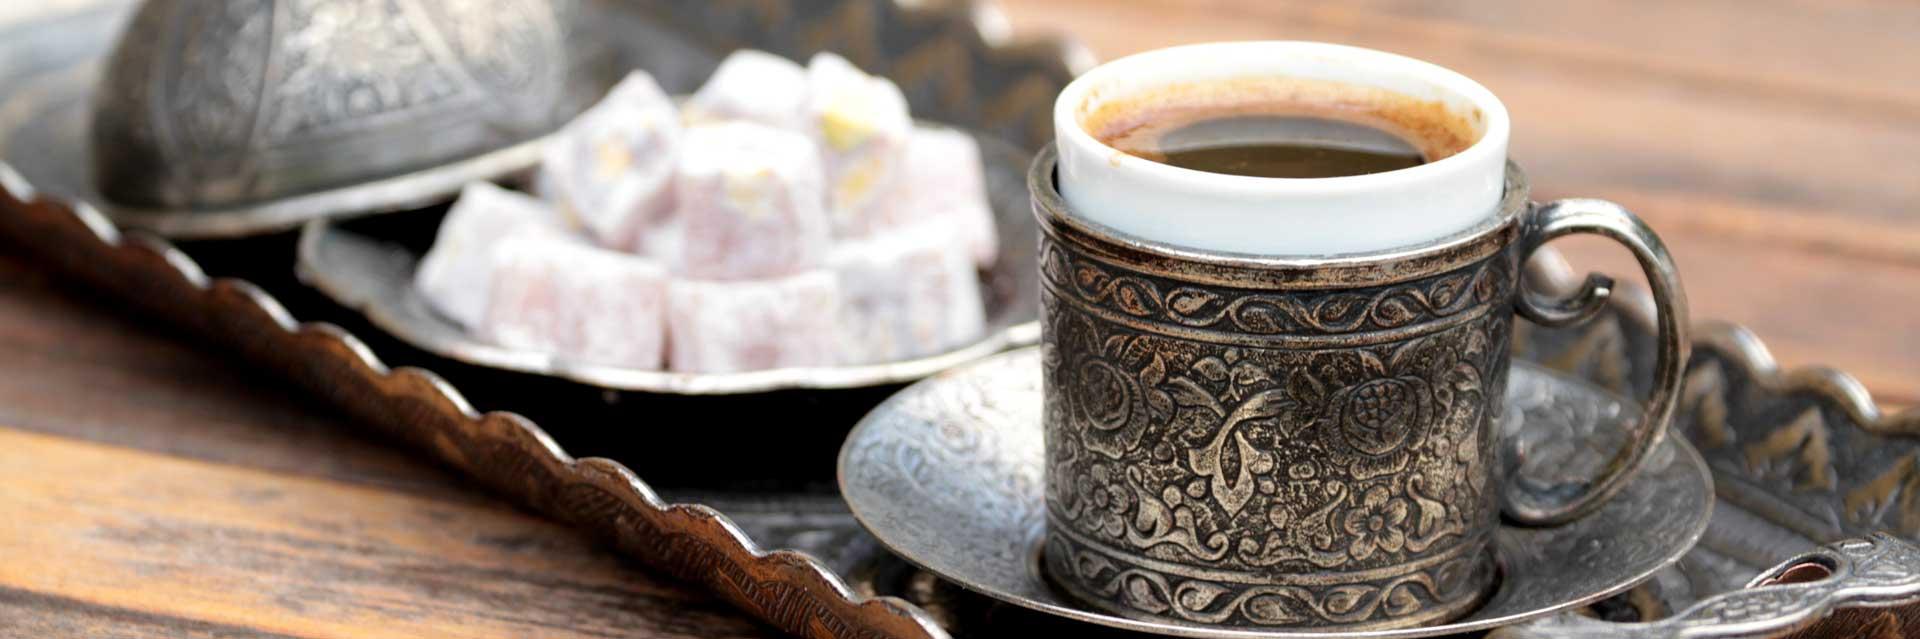 Turkse koffie kahve amsterdam mesken restaurant mesken for Turkse restaurant amsterdam west